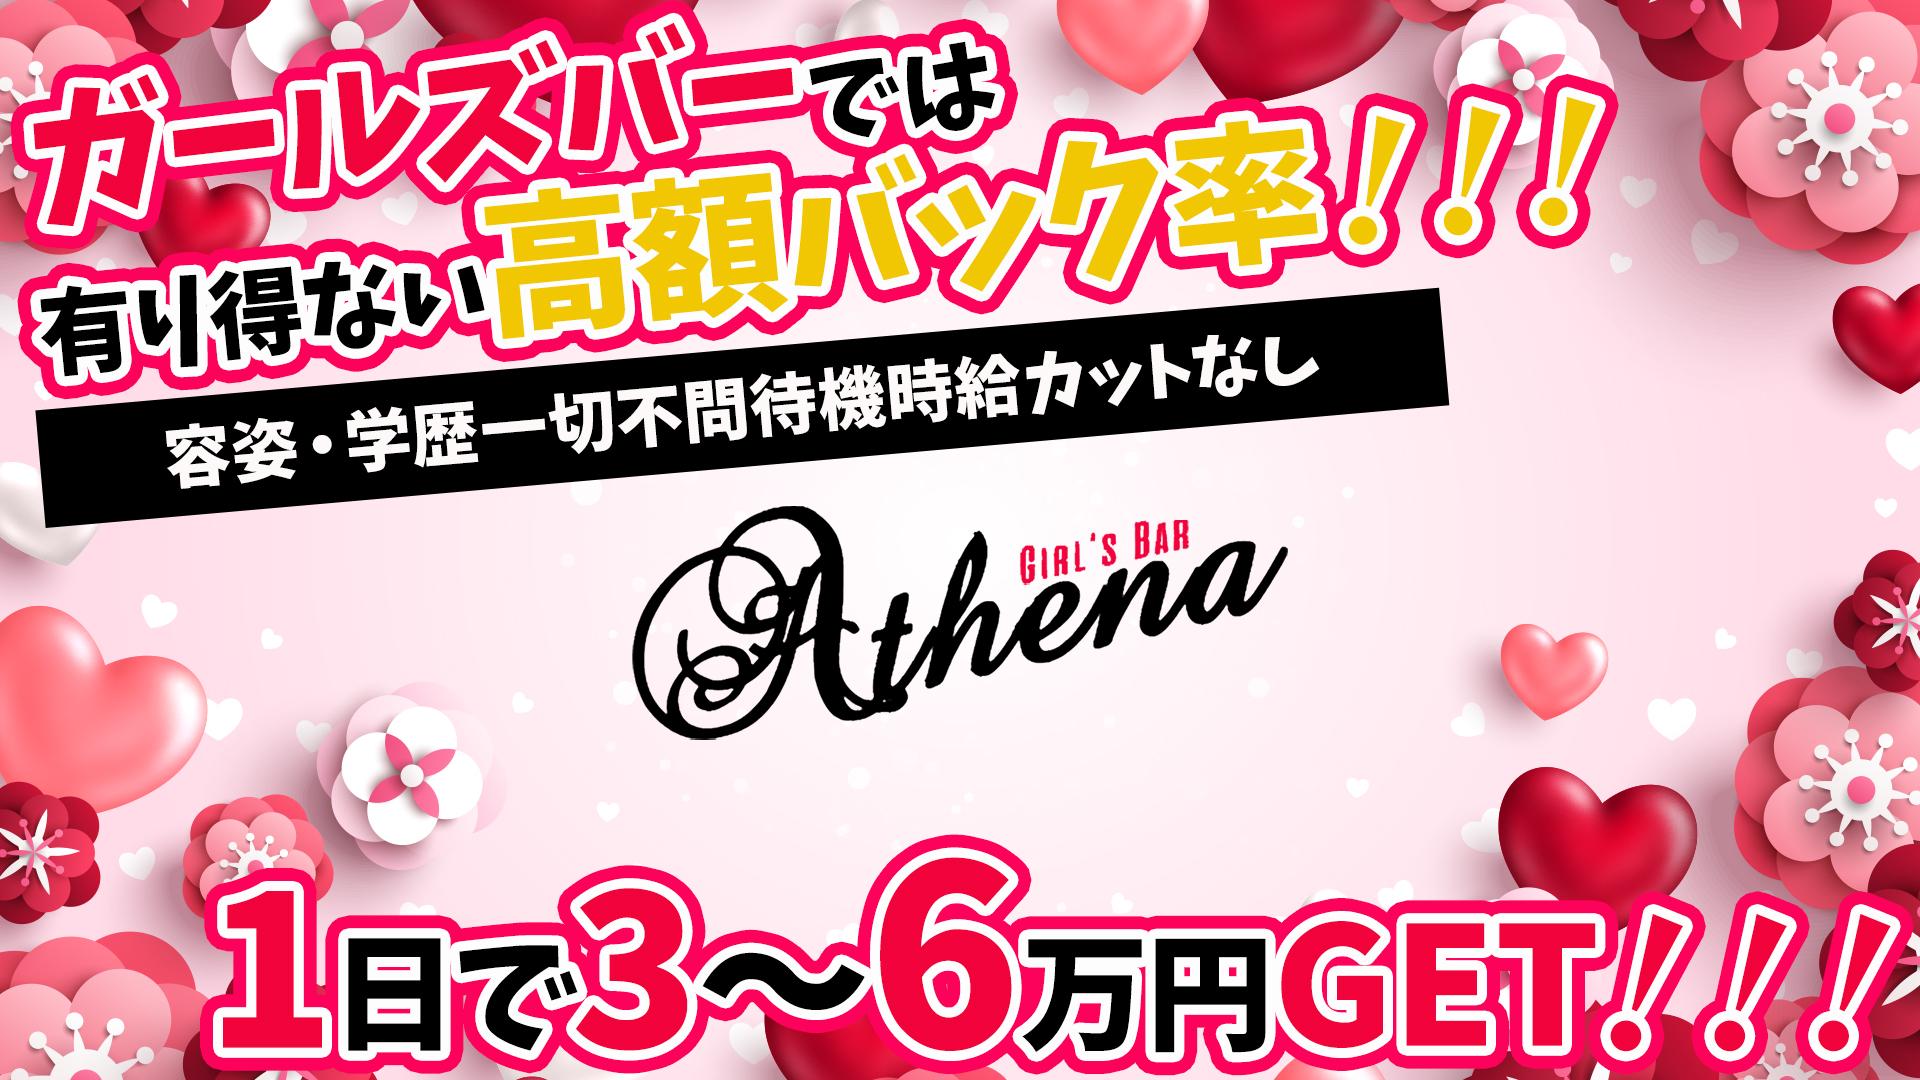 Girl's café&bar Athena<アティーナ> 草加 ガールズバー TOP画像